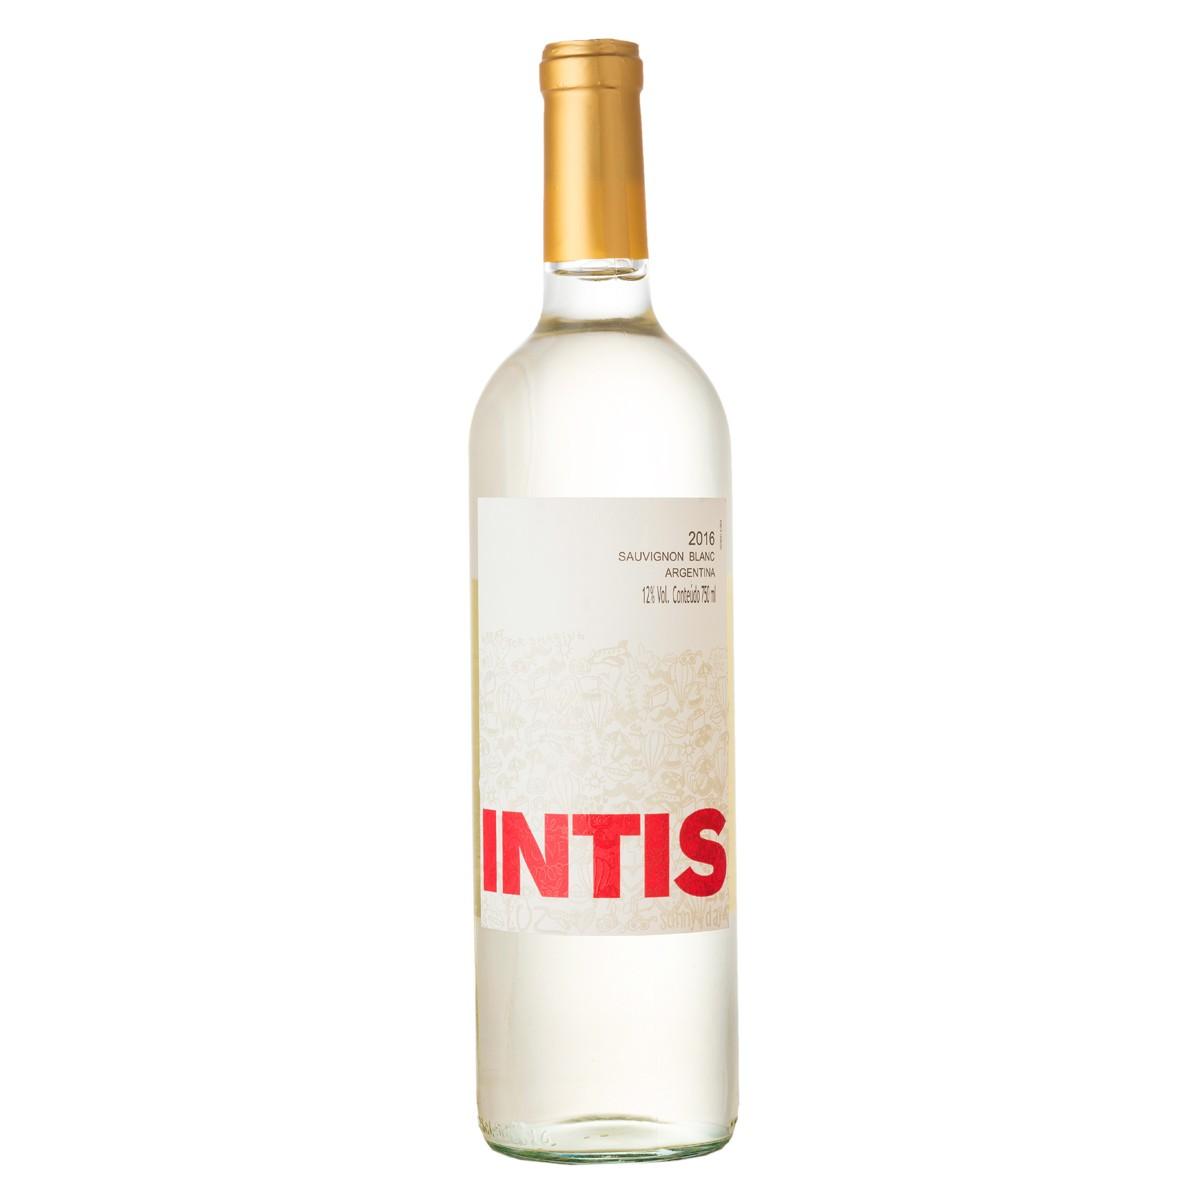 Intis Sauvignon Blanc